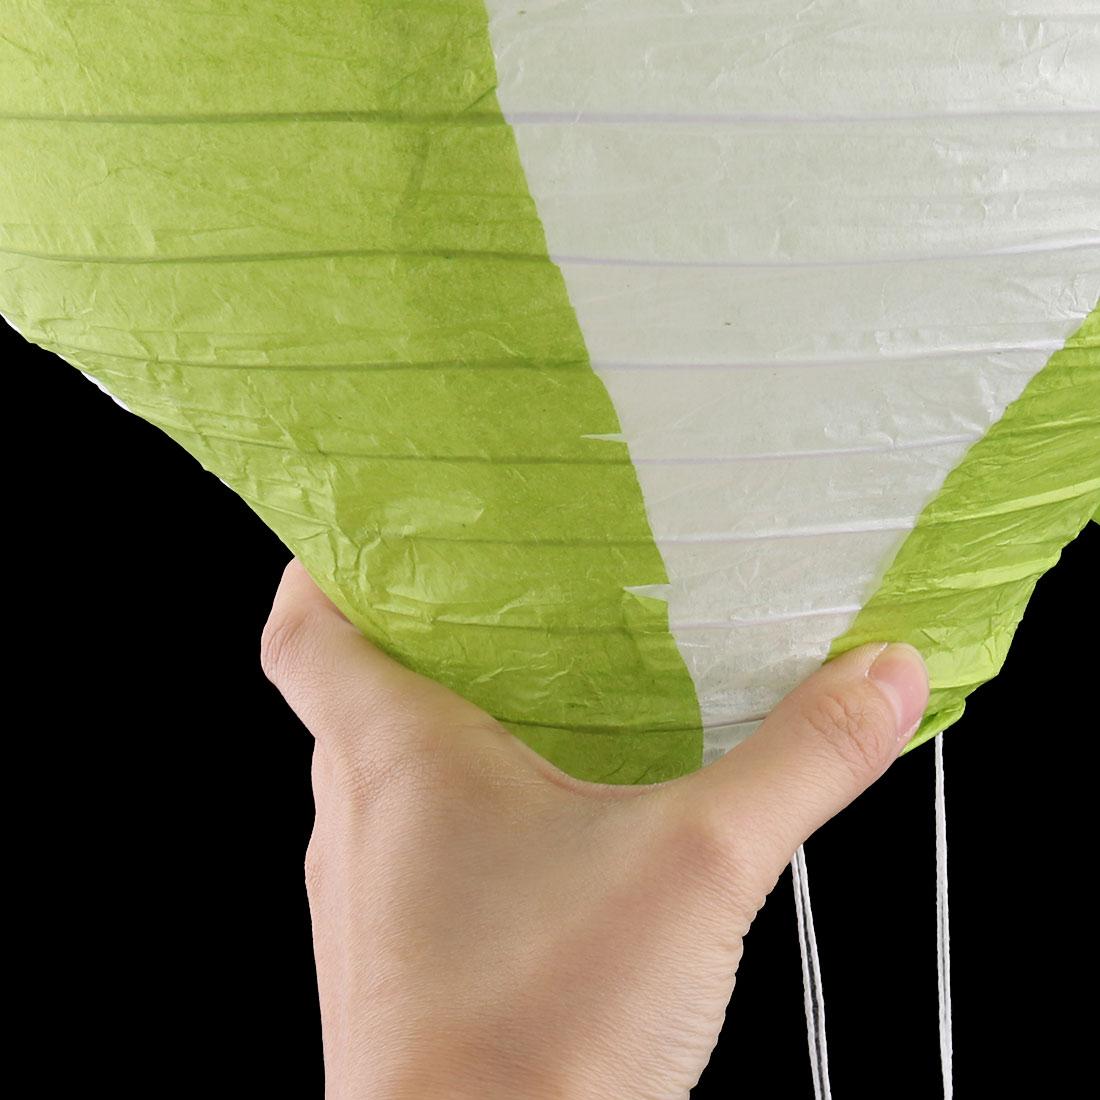 Festival Party Paper DIY Handmade Lightless Hot Air Balloon Lantern Green White - image 2 of 6